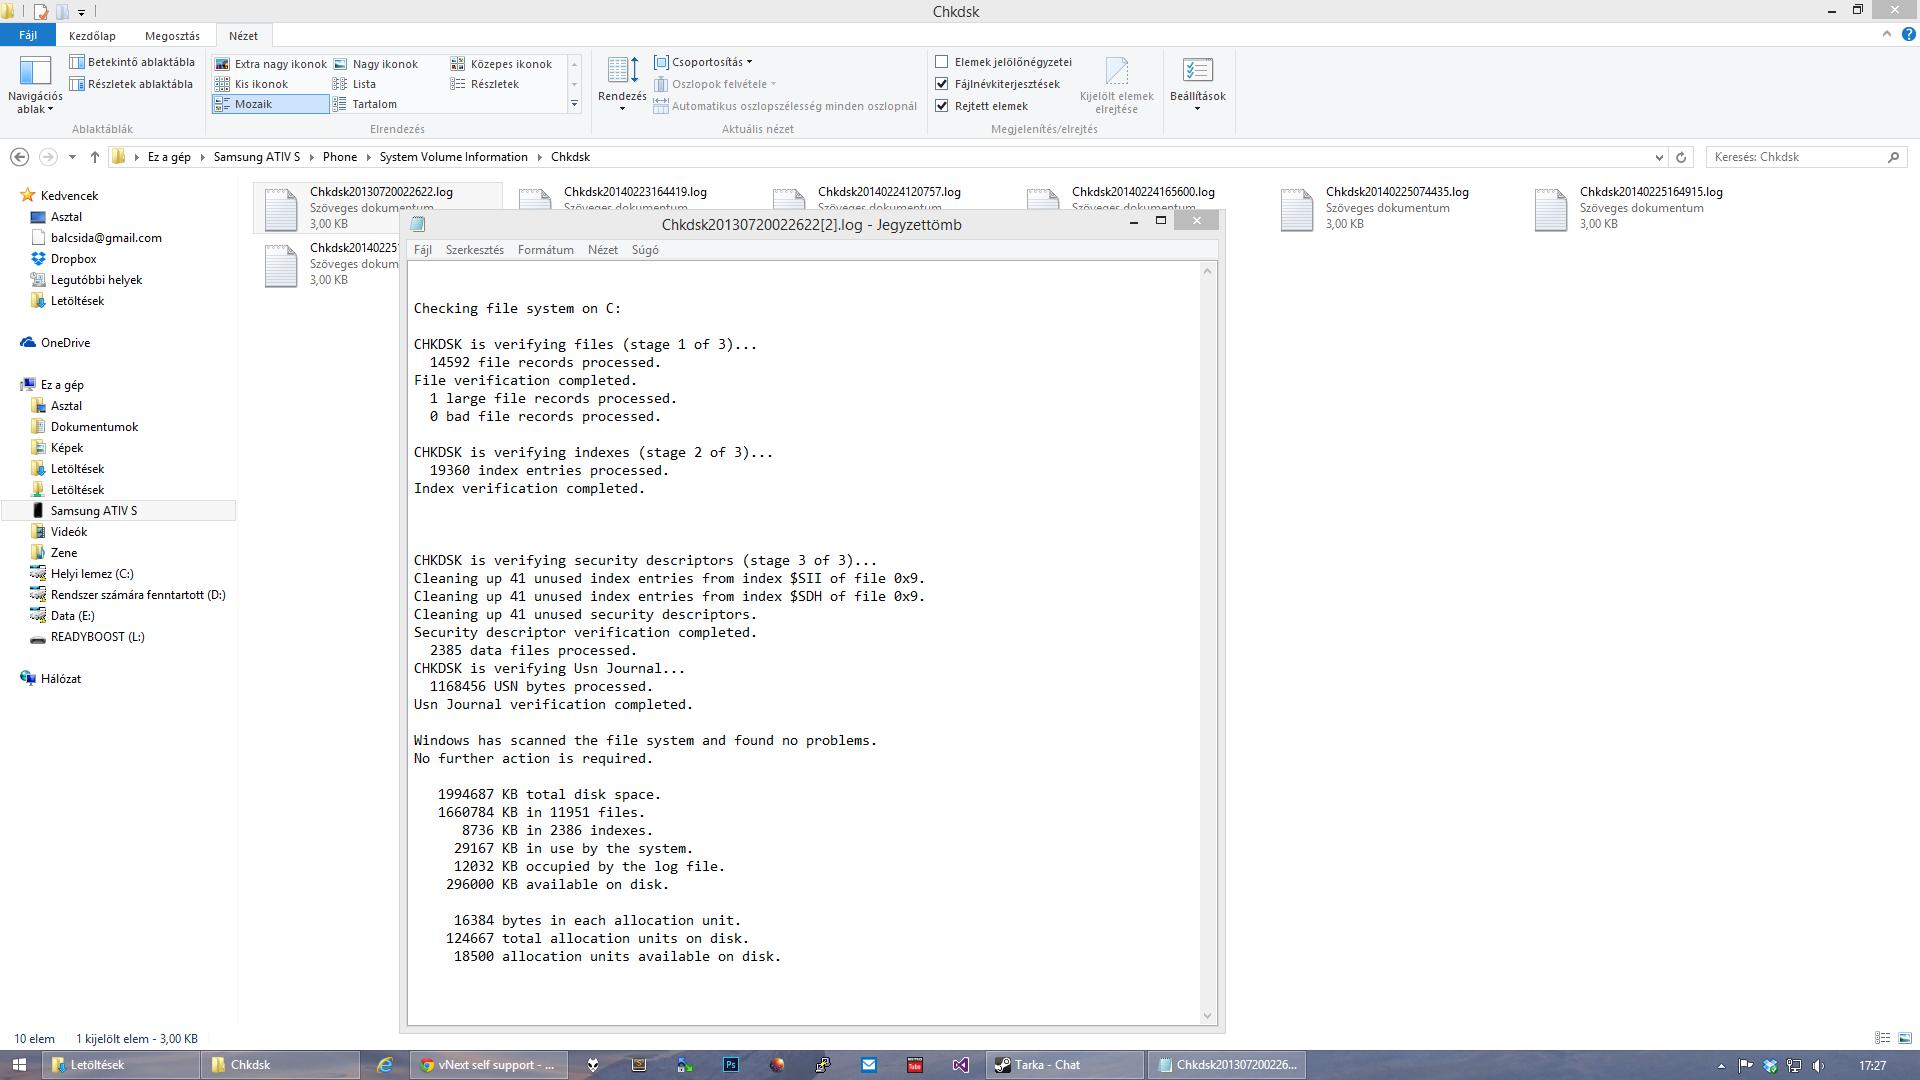 Screenshot 2014-05-17 17.27.03.png